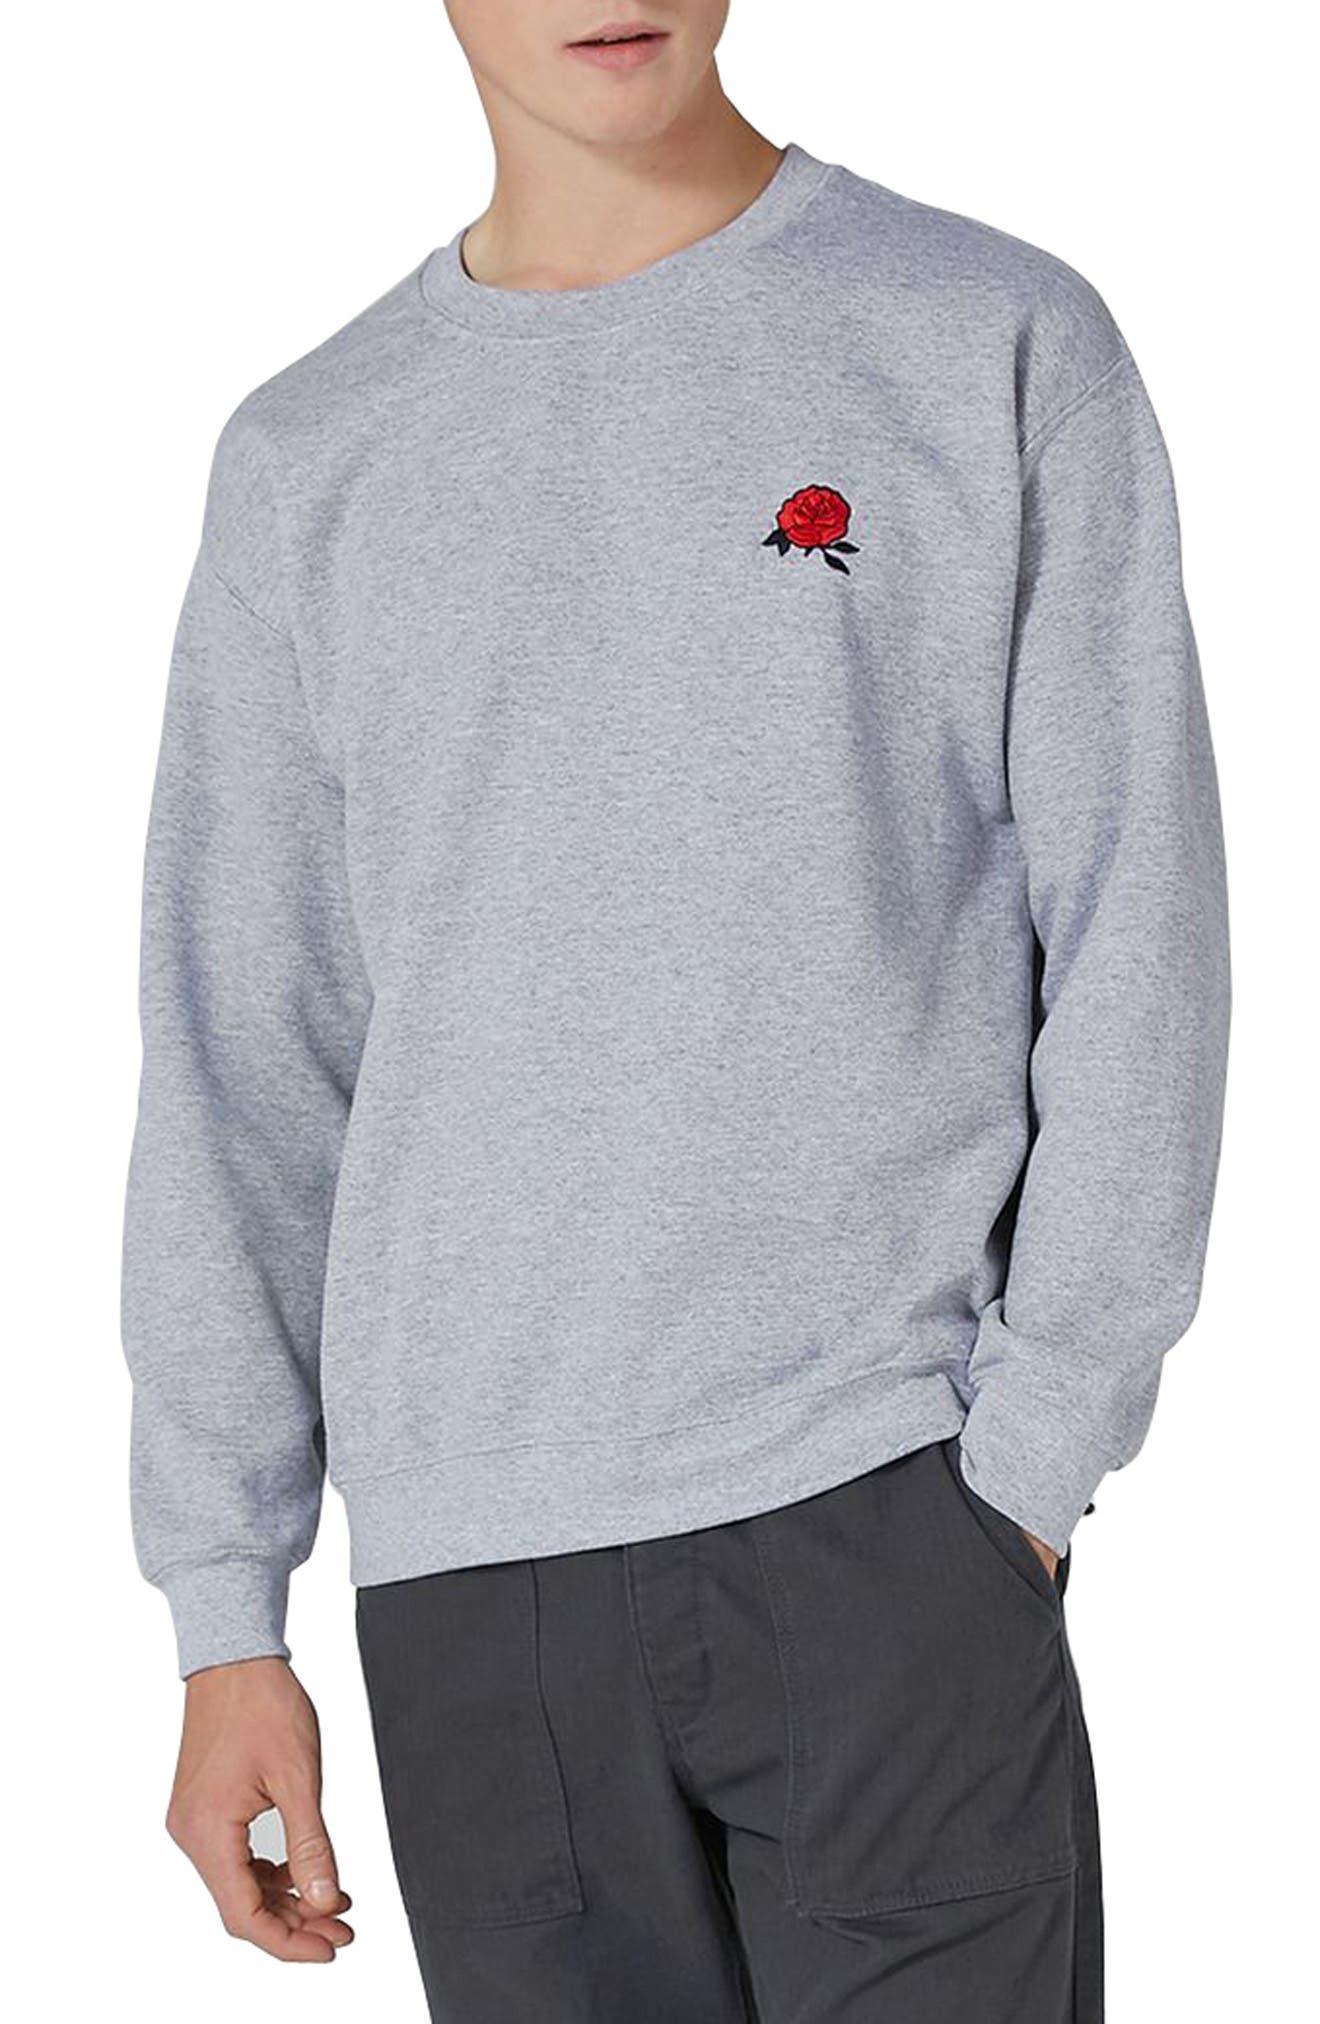 Rose Embroidered Sweatshirt,                         Main,                         color, Light Grey